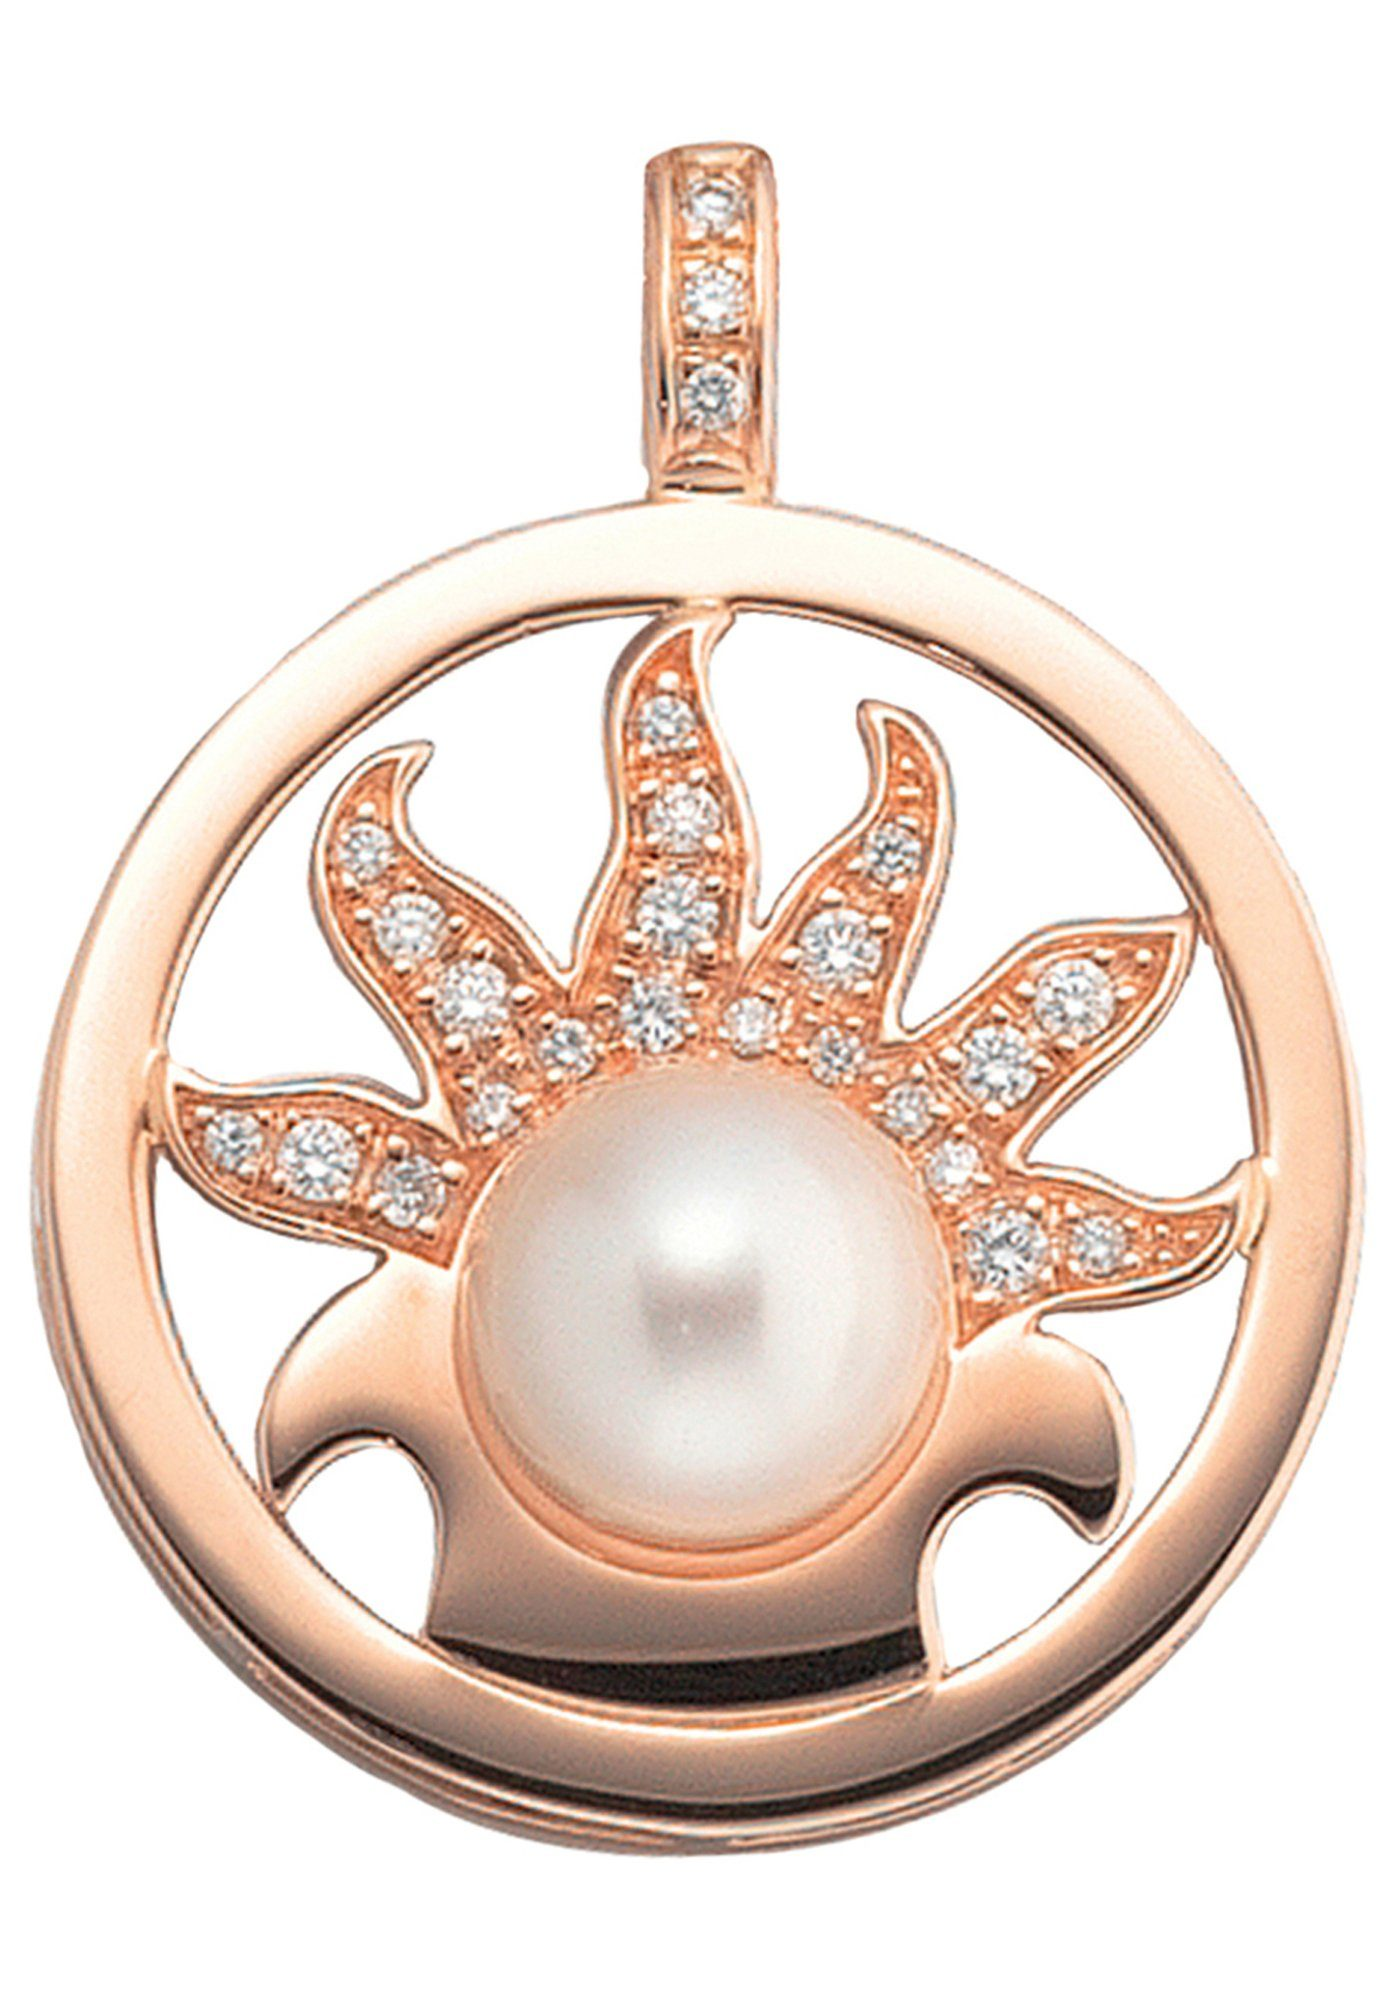 JOBO Perlenanhänger rund 750 Roségold 25 Diamanten 1 Süßwasser Perle